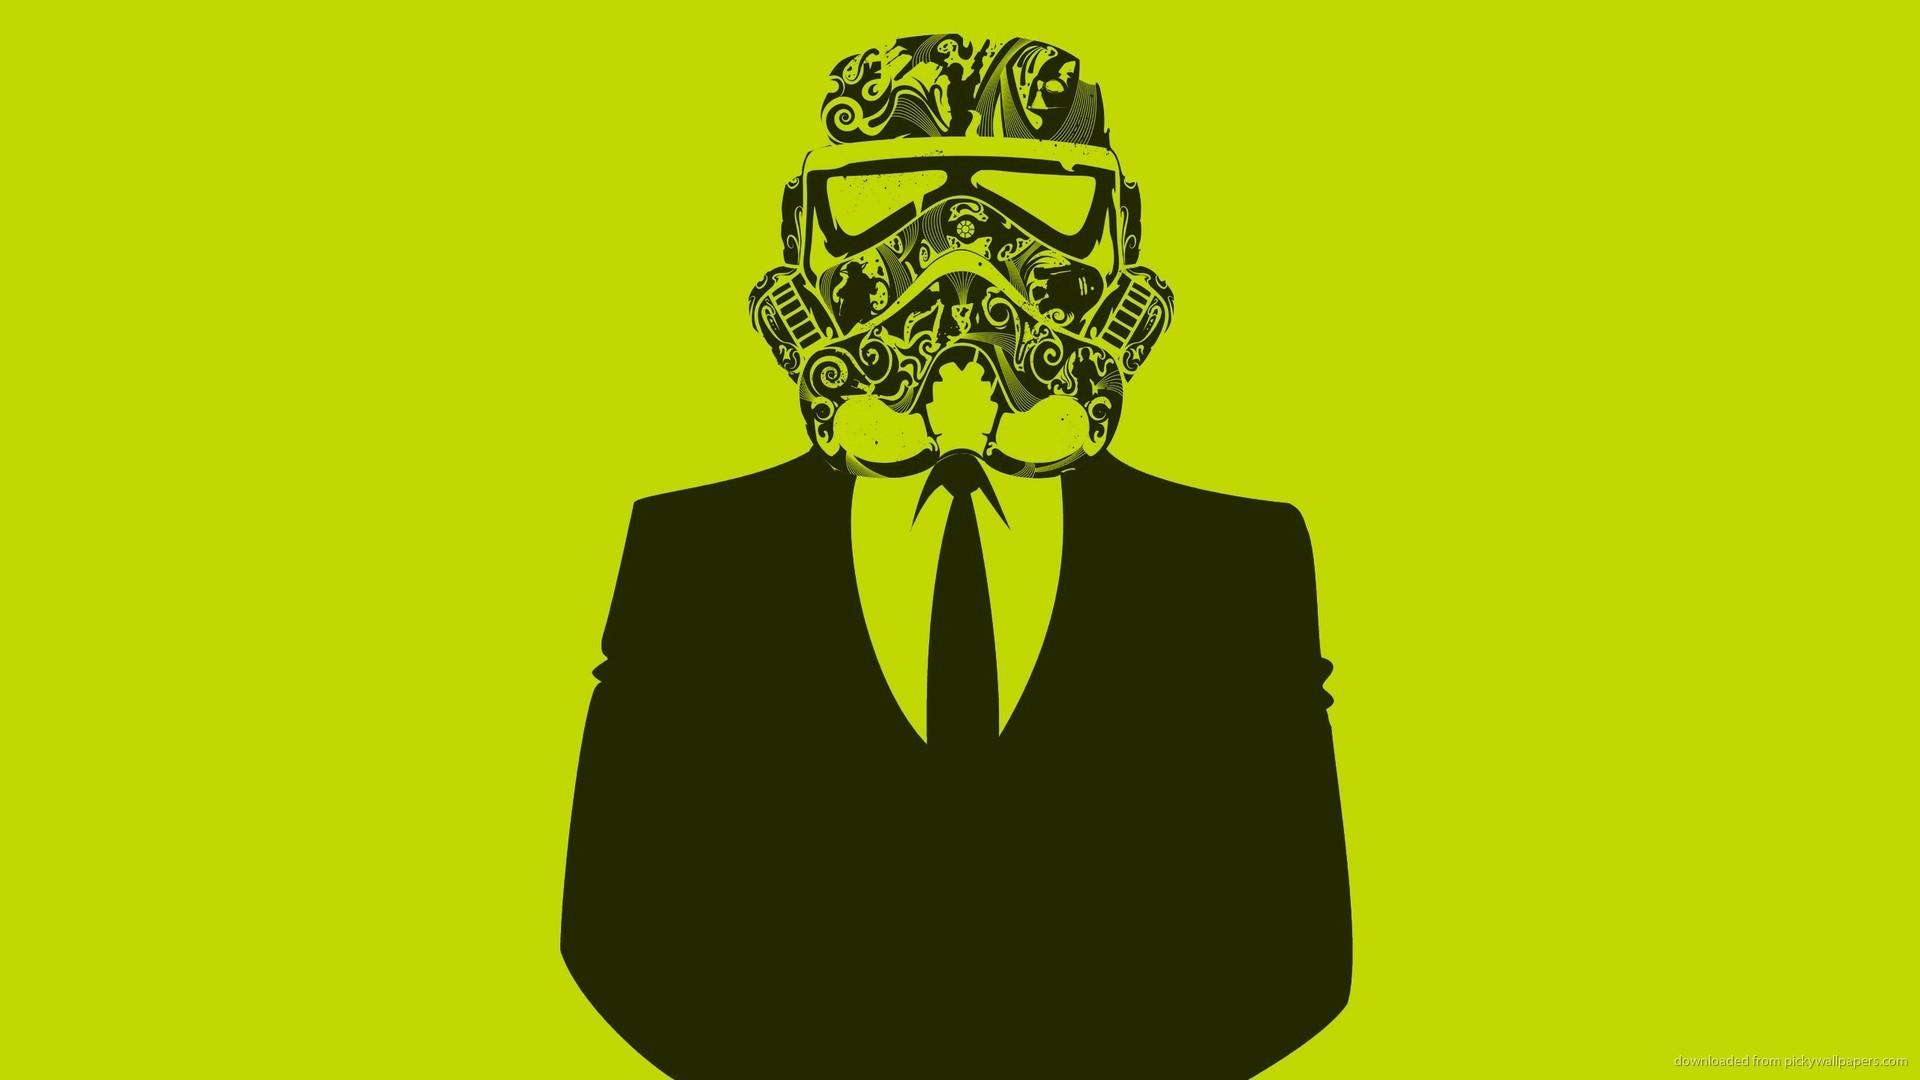 HD Stormtrooper In A Suit wallpaper